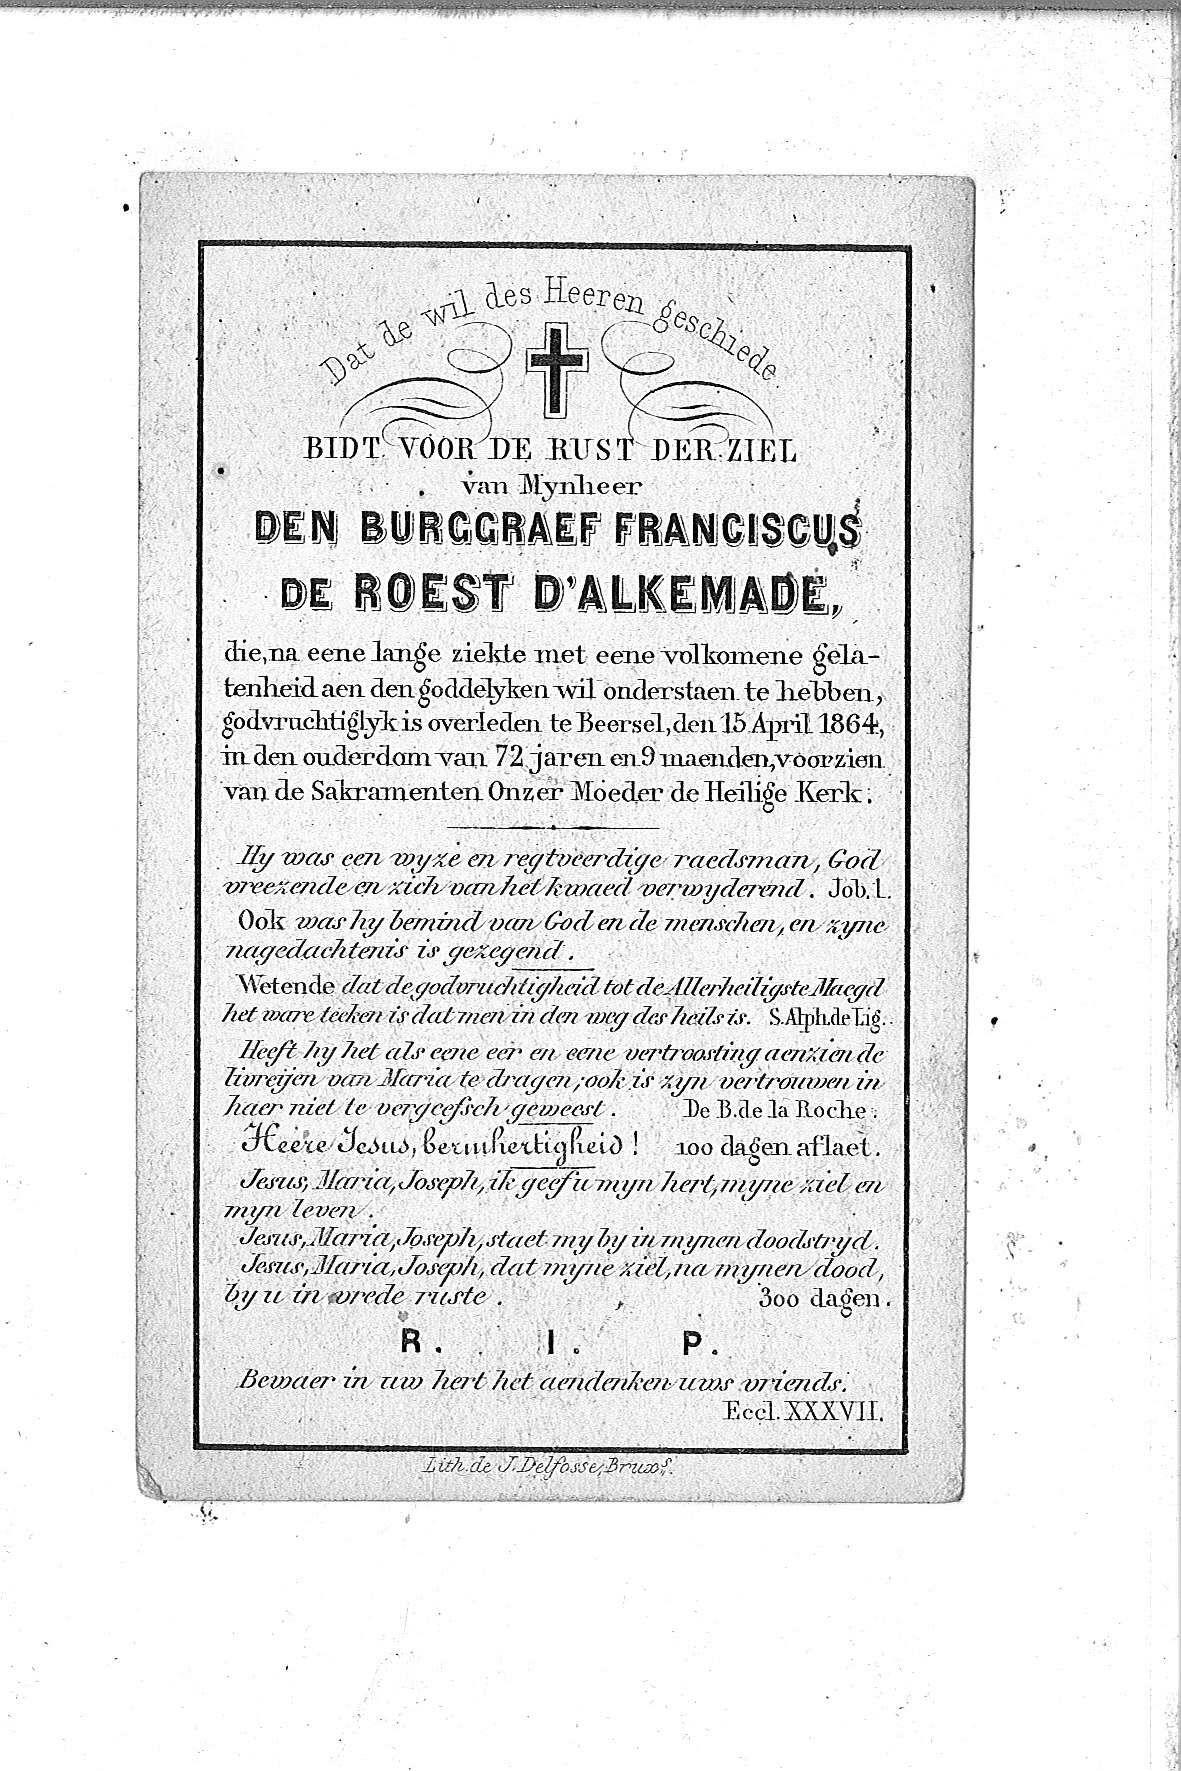 Franciscus-(1864)-20121025155606_00024.jpg